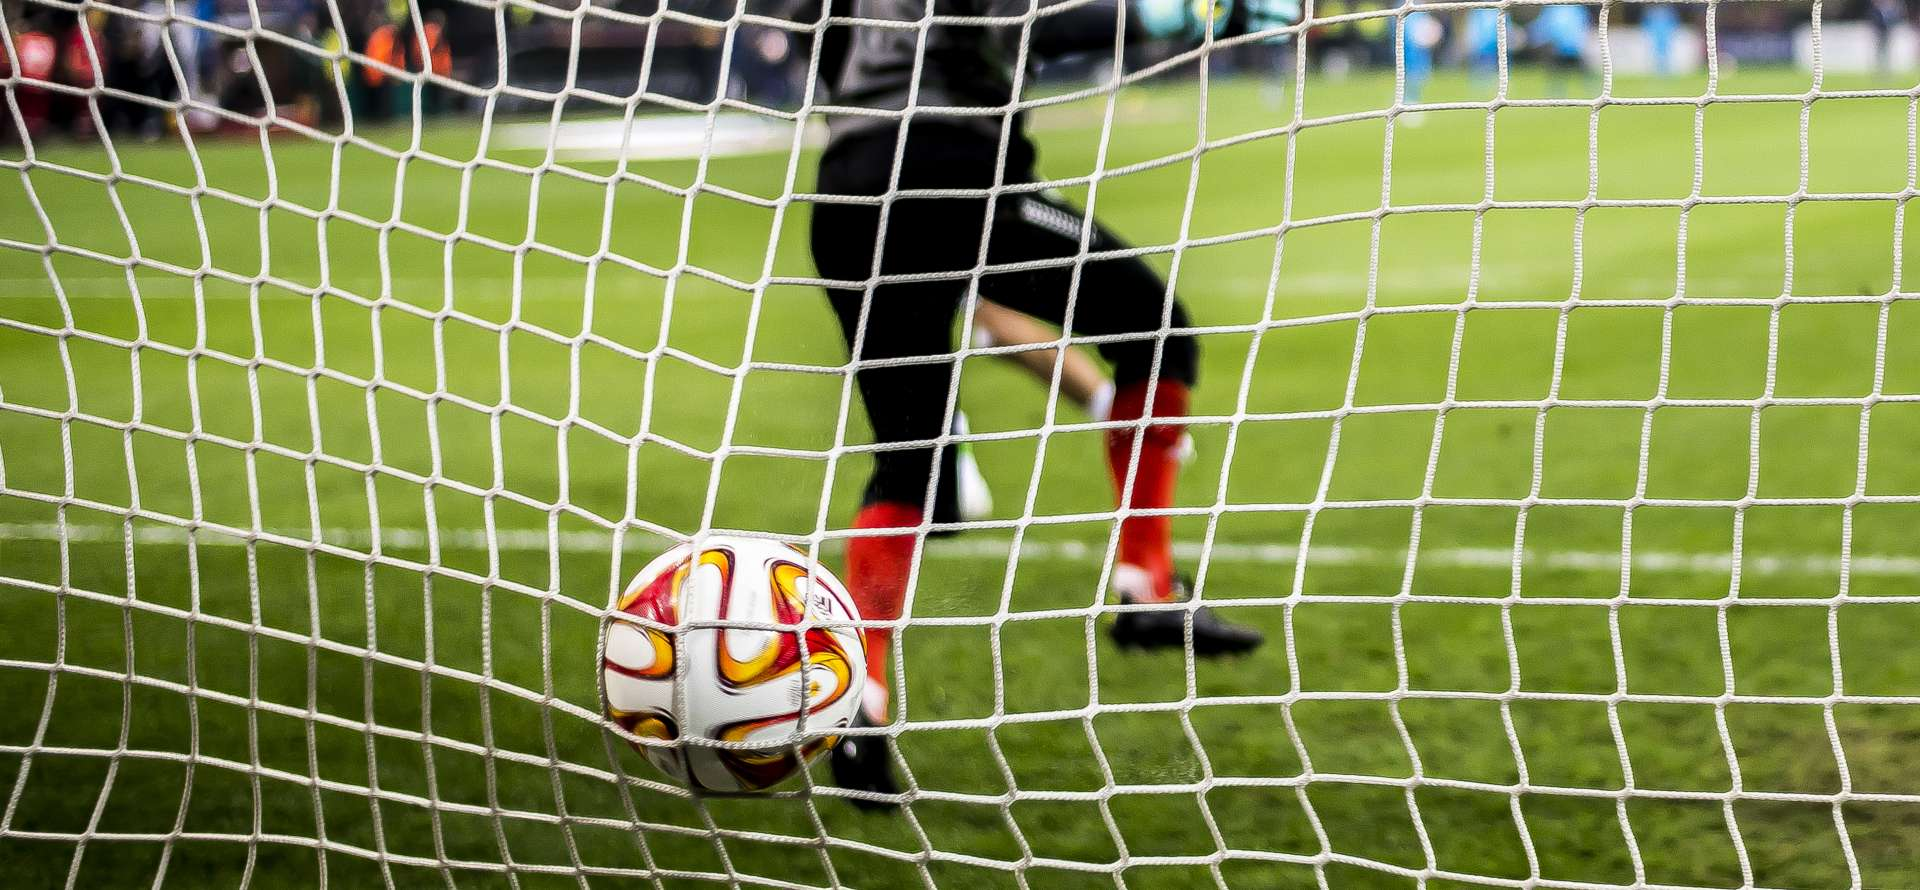 AIC senior league, AIC, Damiano Tommasi, Mauro Esposito, Maurizio Lauro, Fabio Poli